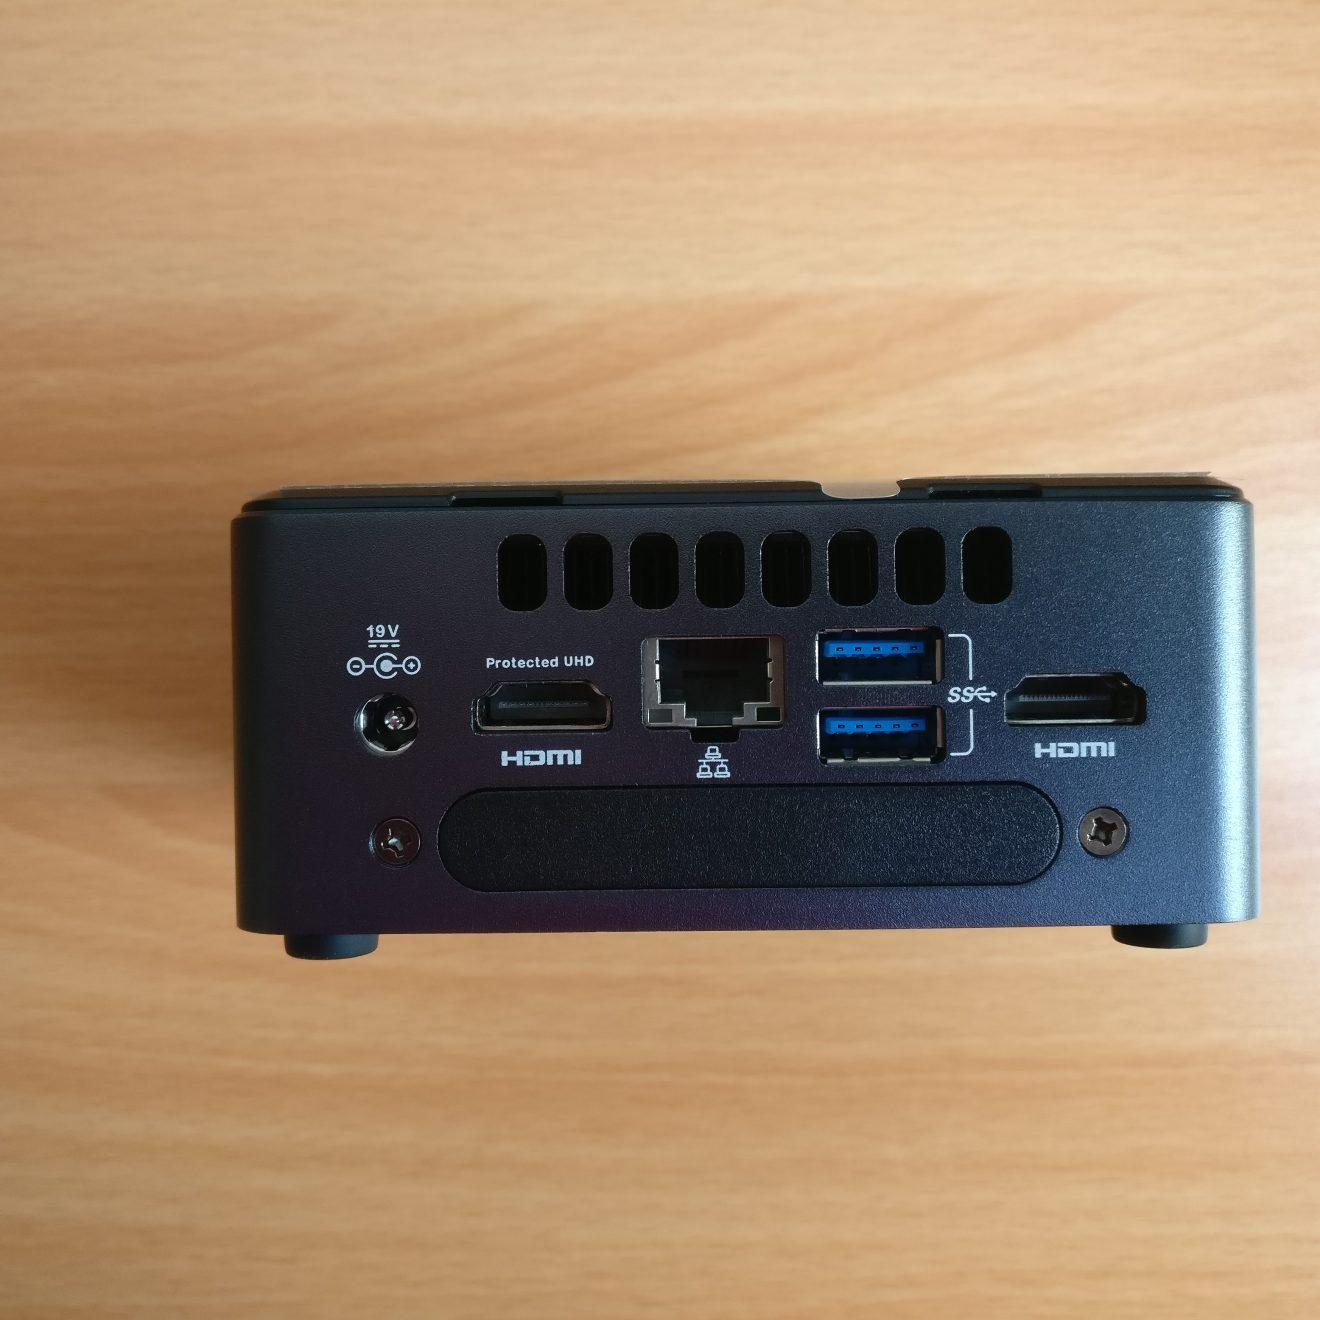 domalab.com Intel NUC 7i7DNHE setup